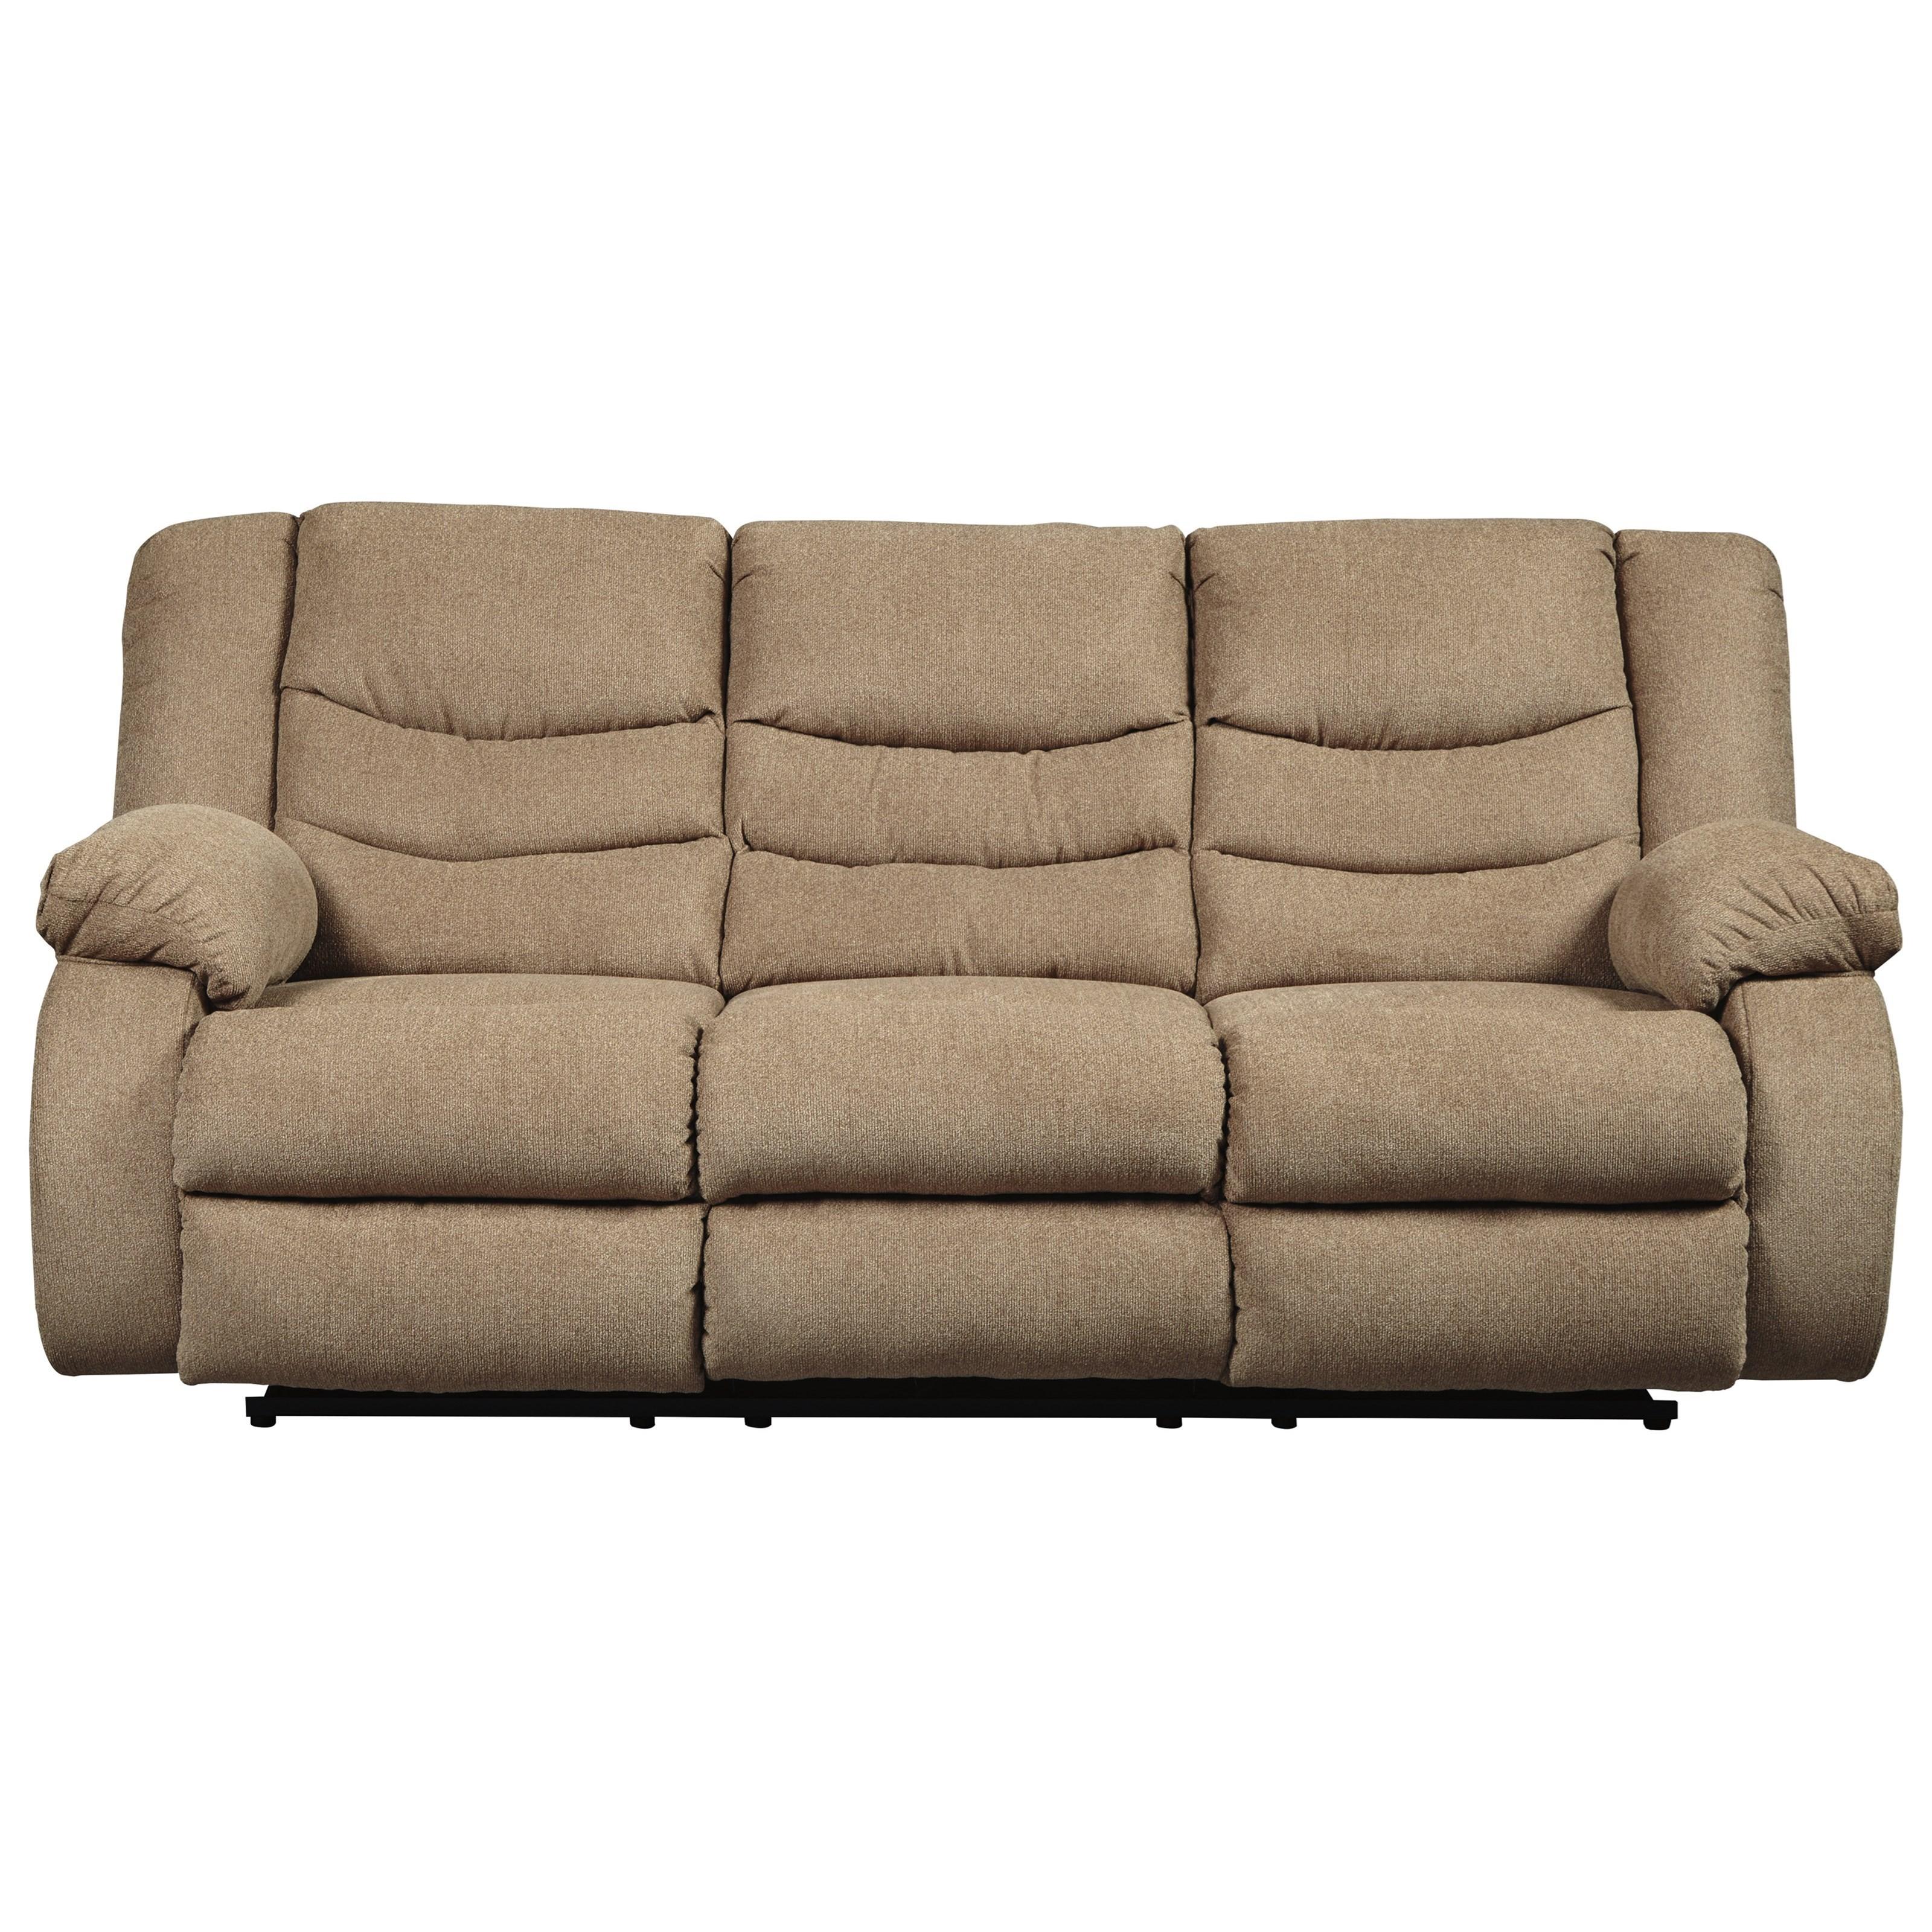 ashley sofa recliners crypton super fabric signature design by tulen contemporary reclining